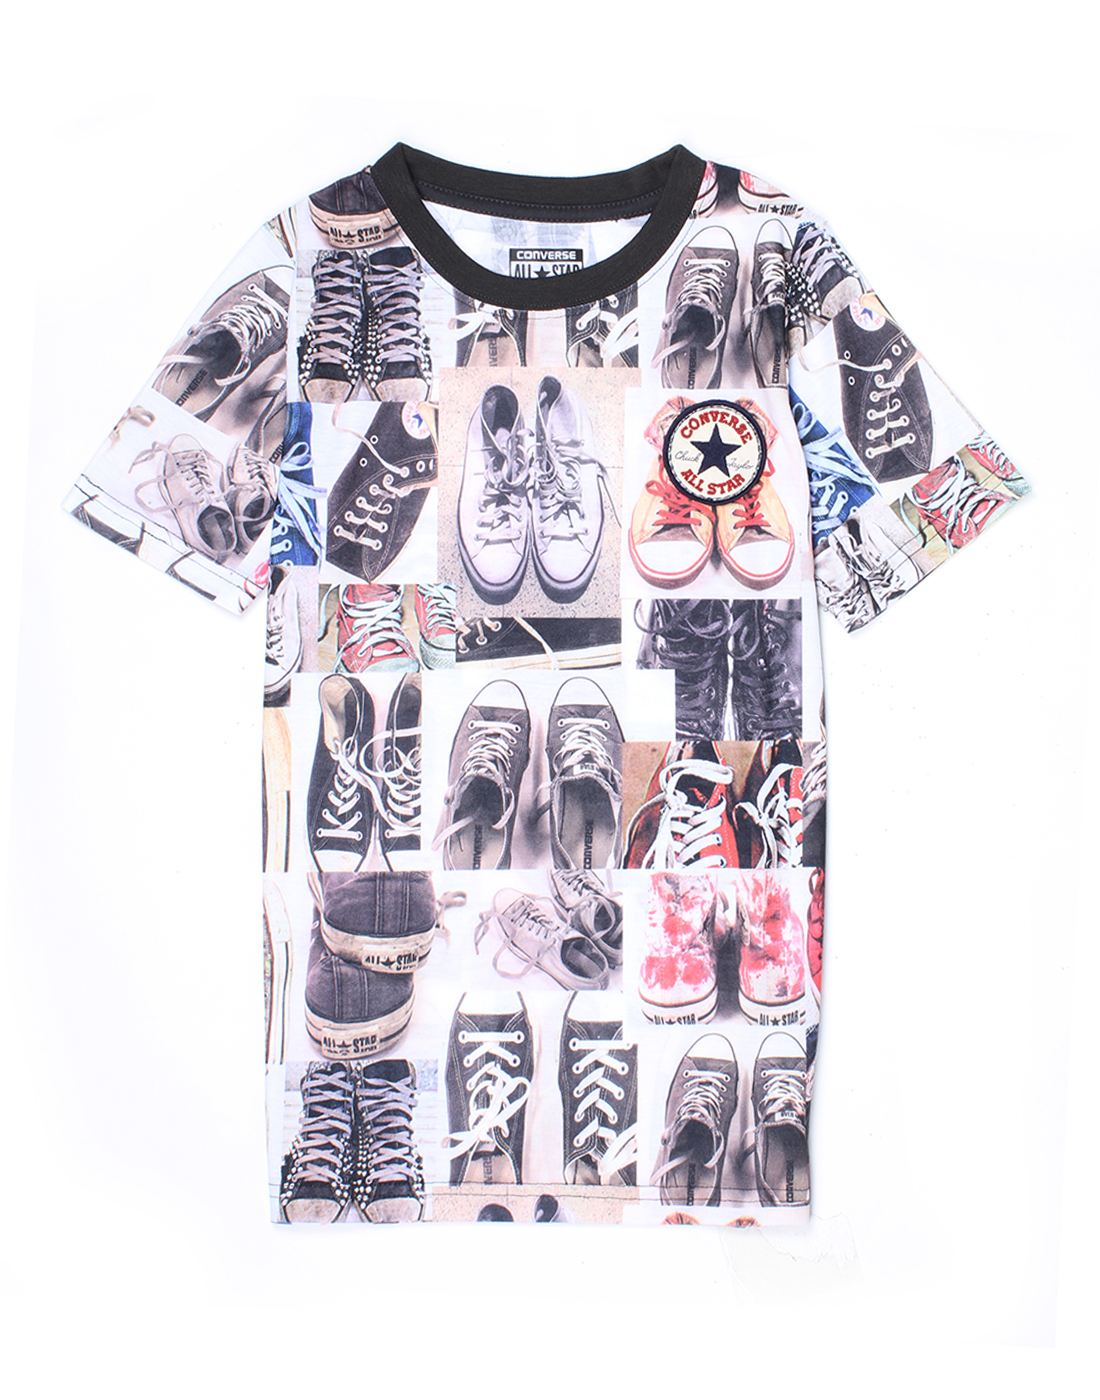 Converse Boys Multicolor T-Shirt